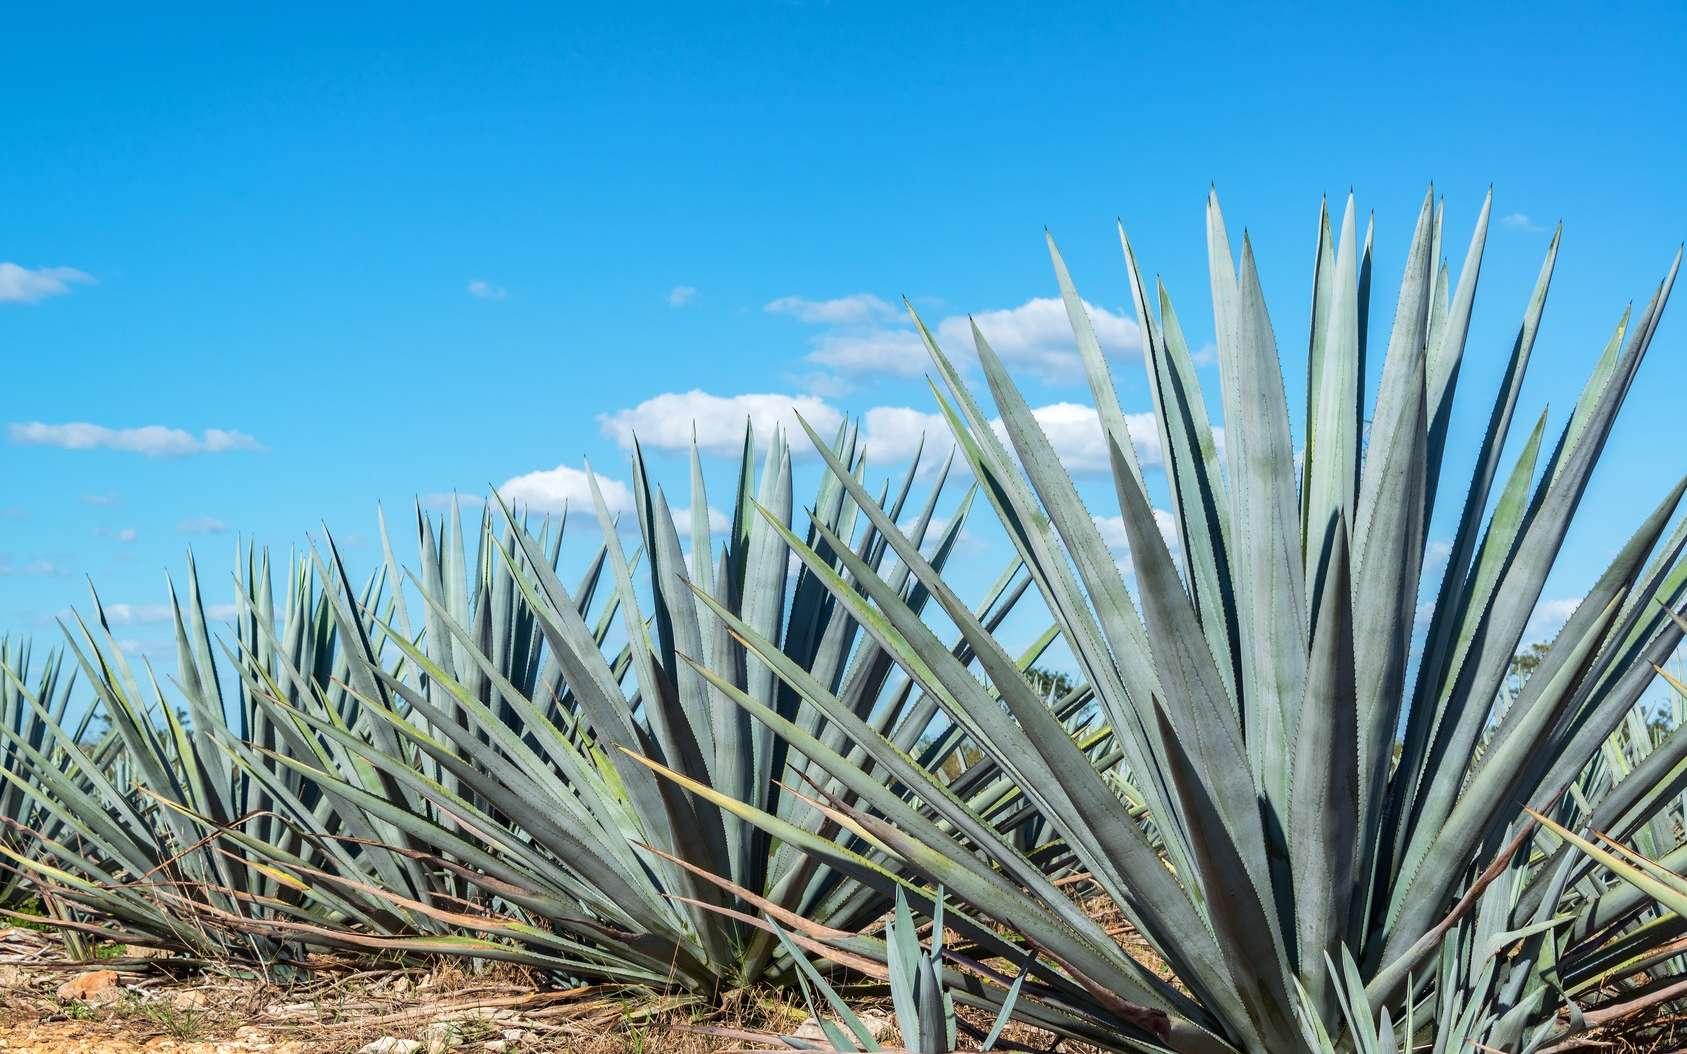 L'agave bleu ou Agave tequilana. © jkraft5, Fotolia